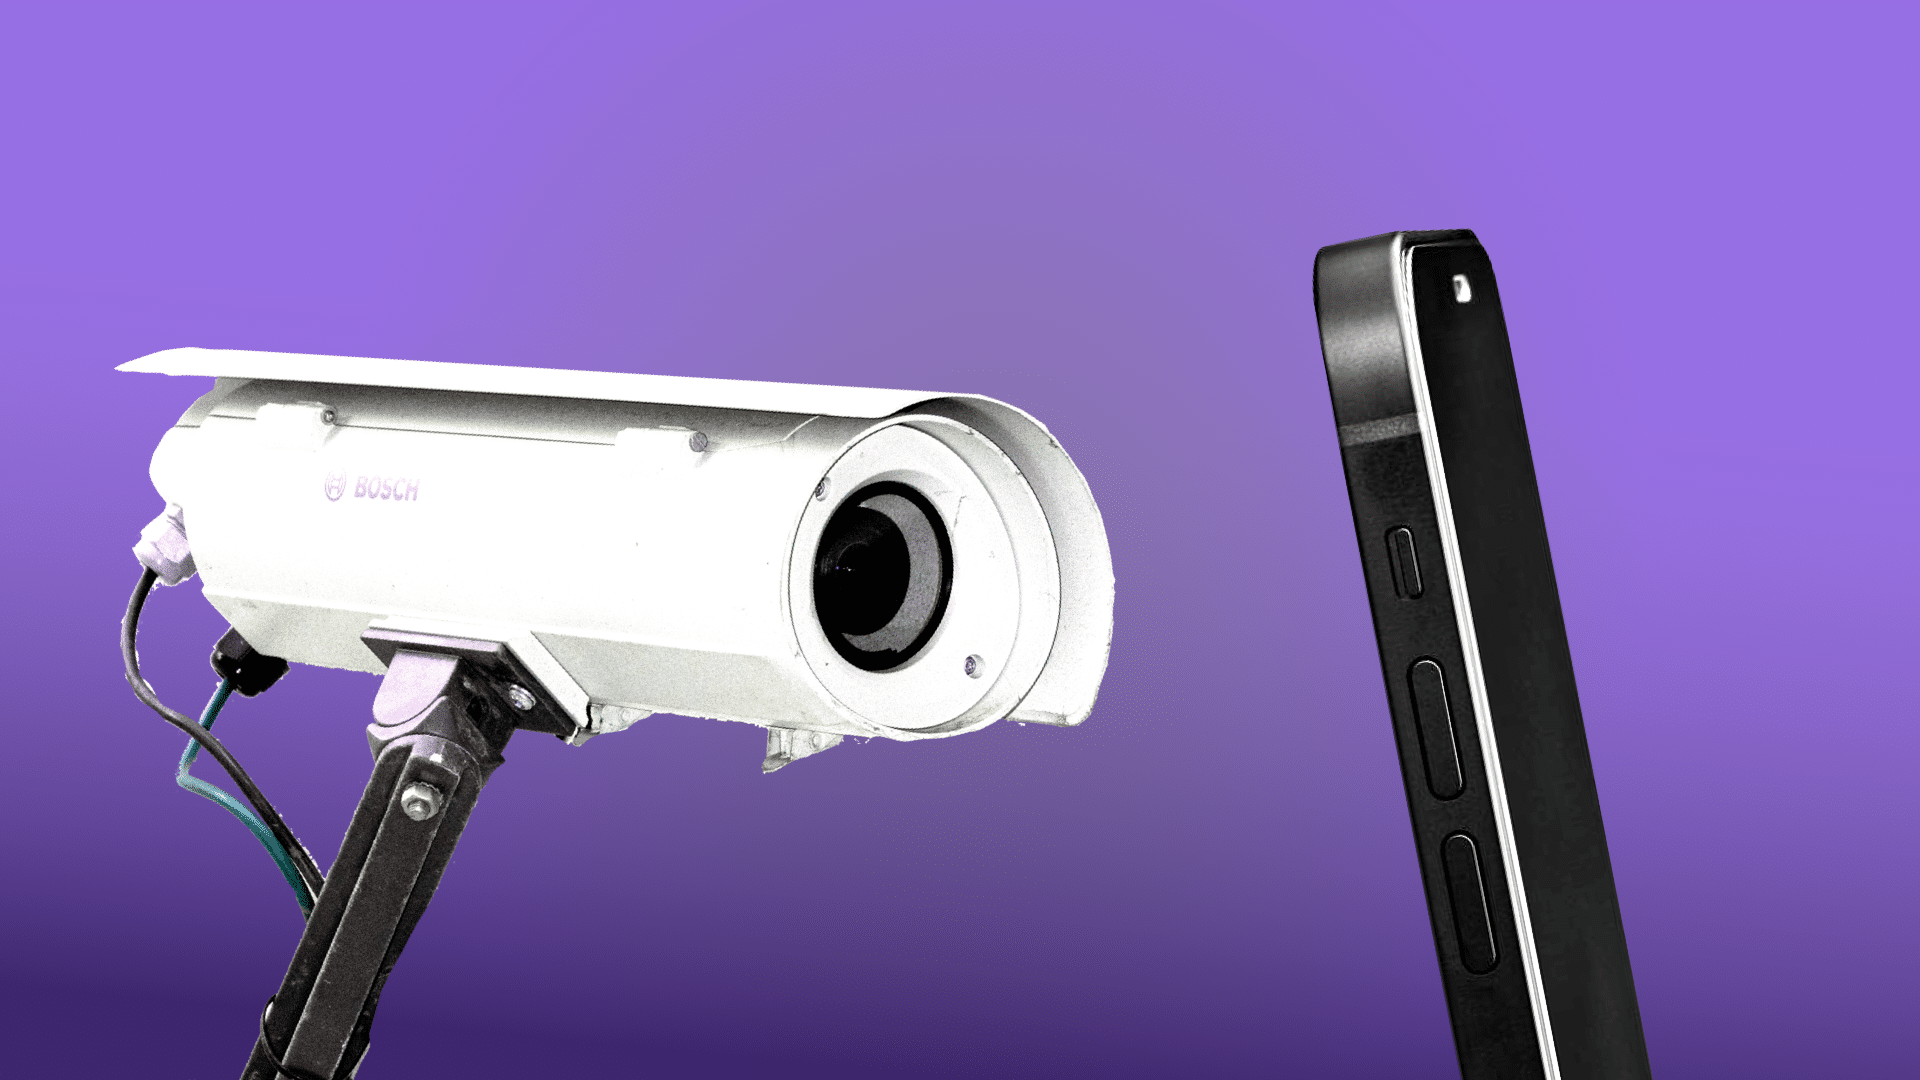 Illustration image of surveillance camera pointed at Phone